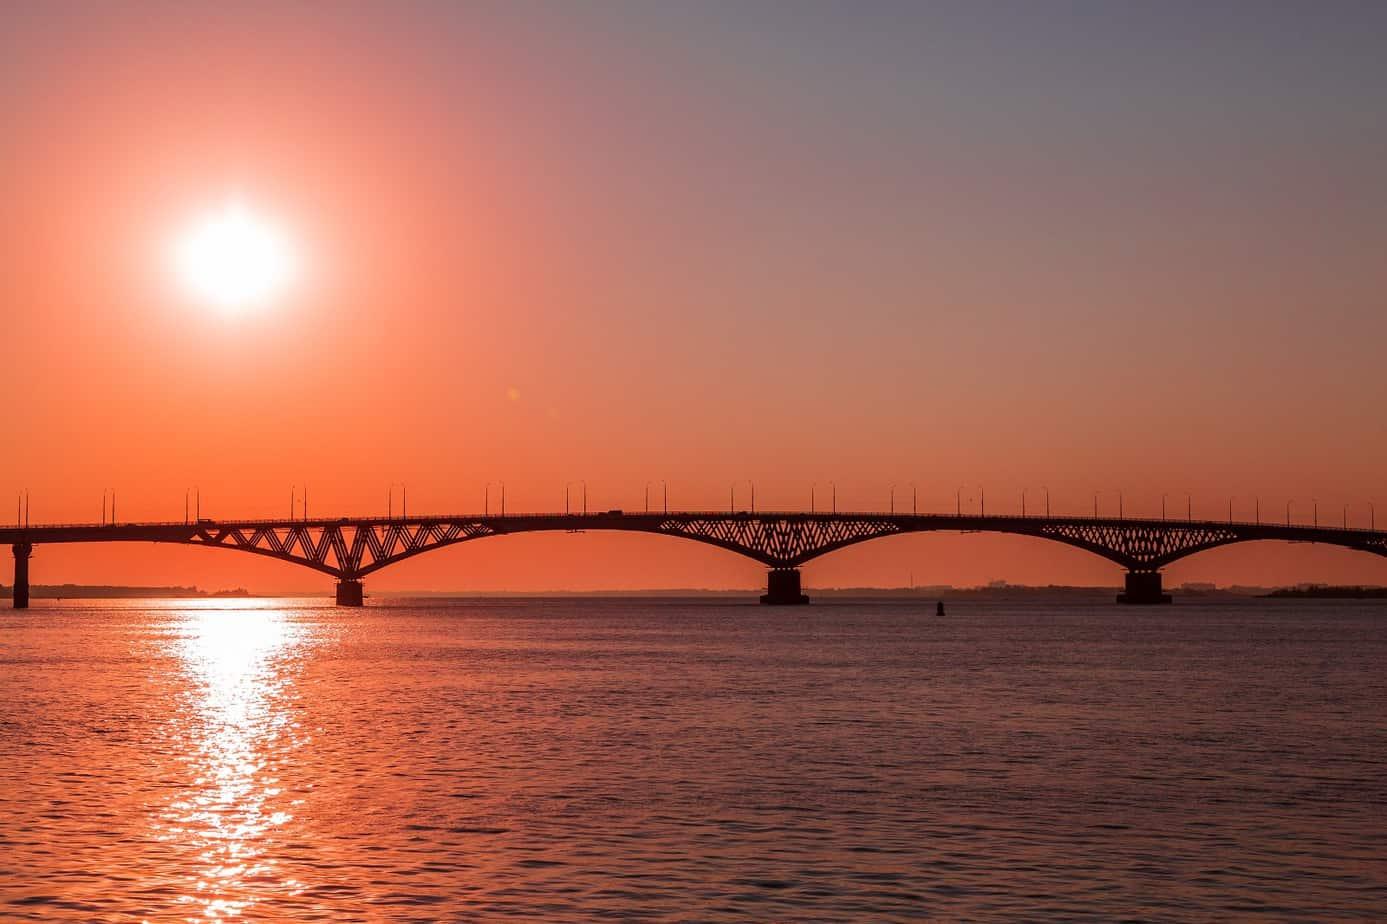 Saratow Brücke